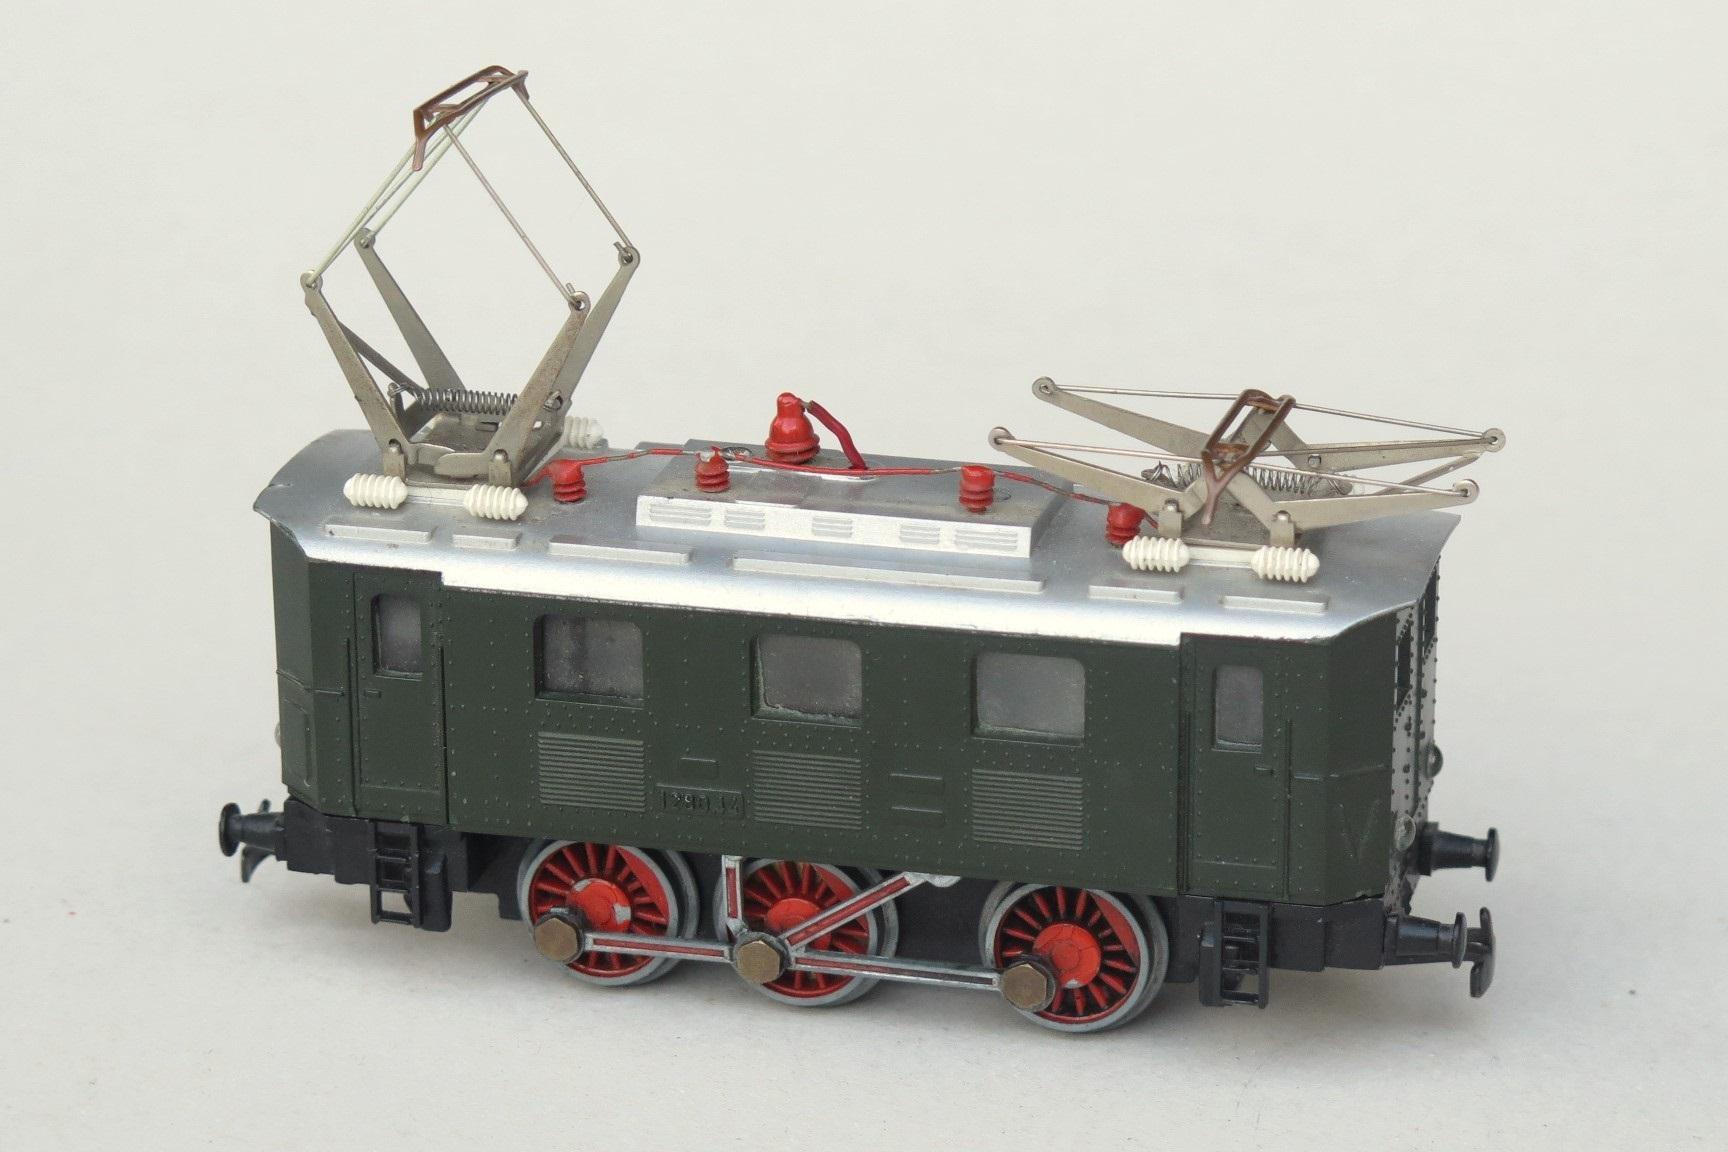 Kleinbahn_H0_scale_model_railway_ÖBB_electric_locomotive_1280.jpg